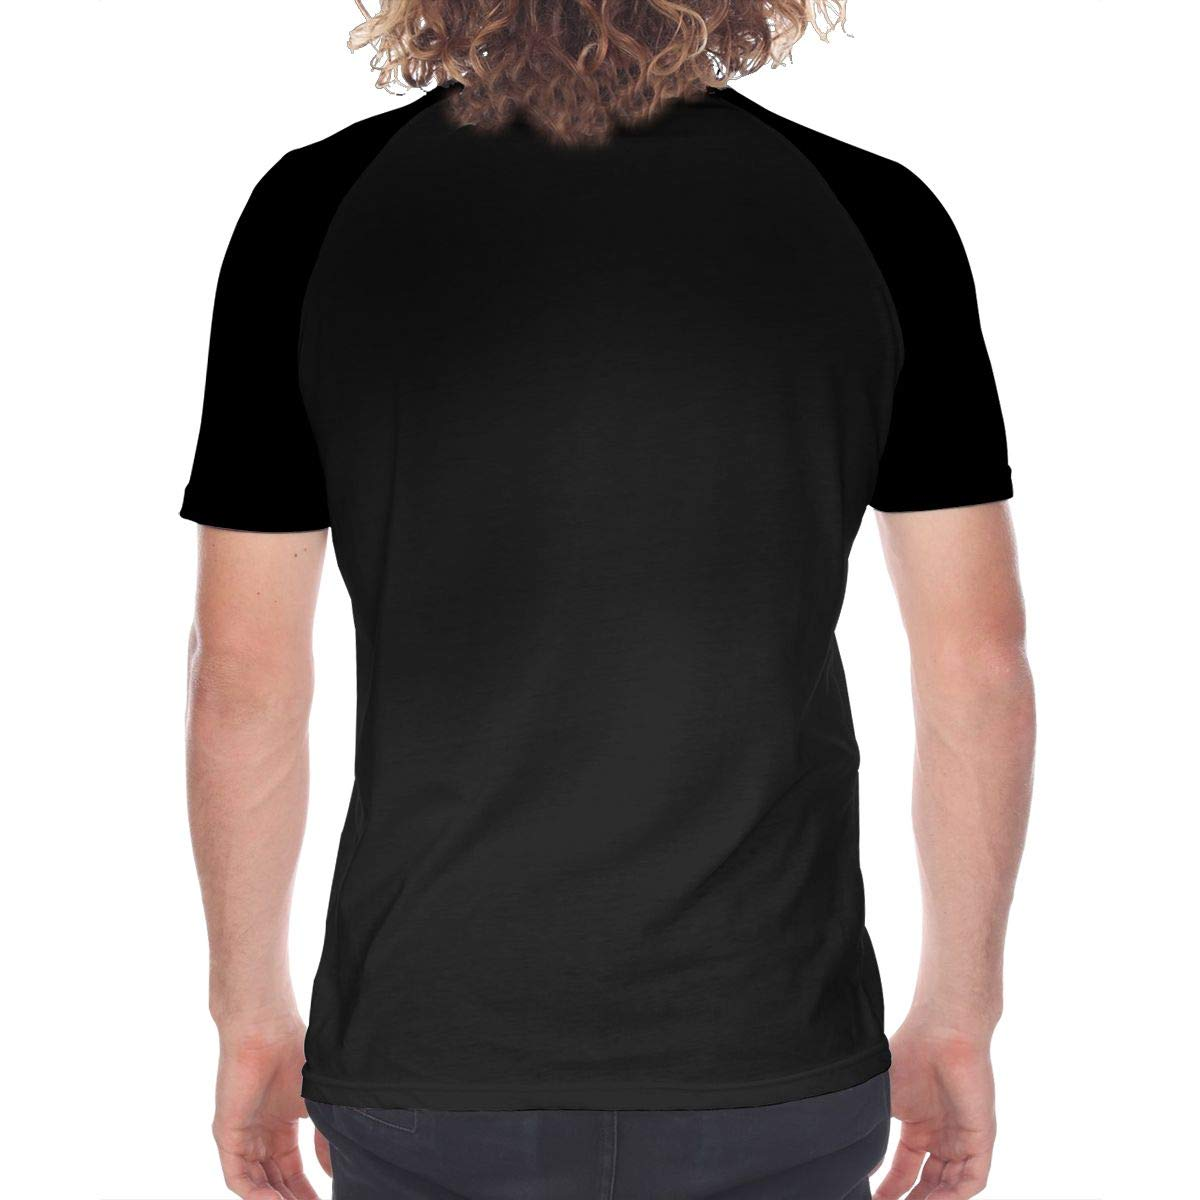 FwadGacx Kate Bush Hounds of Love Mens Youth Stylish Short Sleeves Full Size Printed Baseball Tee Gift